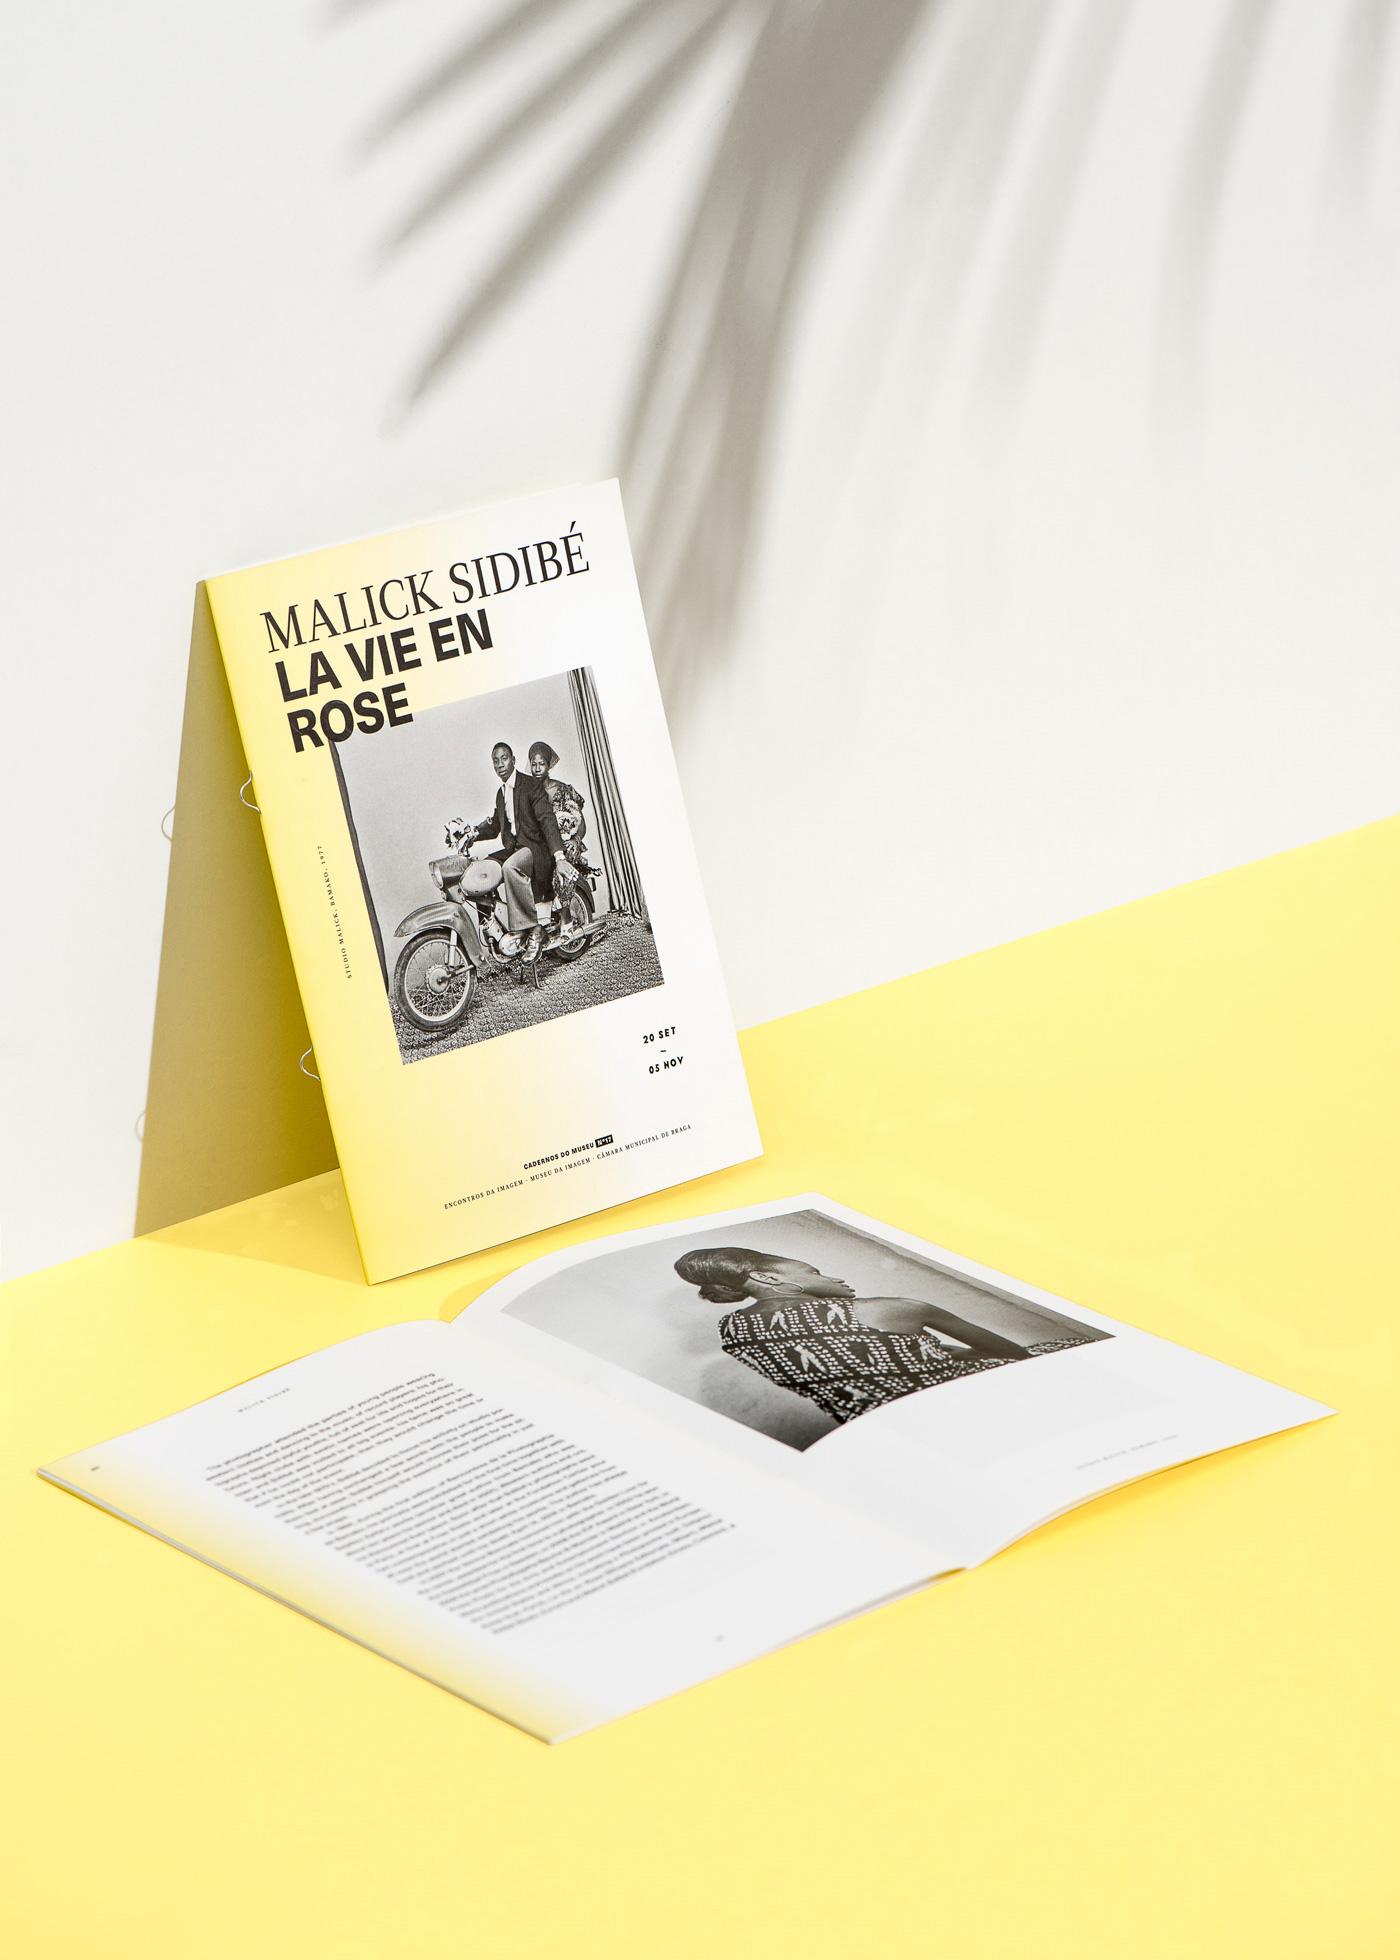 Encontros+da+Imagem+2016+Malick+Sidibé+exhibition+booklet+by+Gen+Design+Studio.jpg